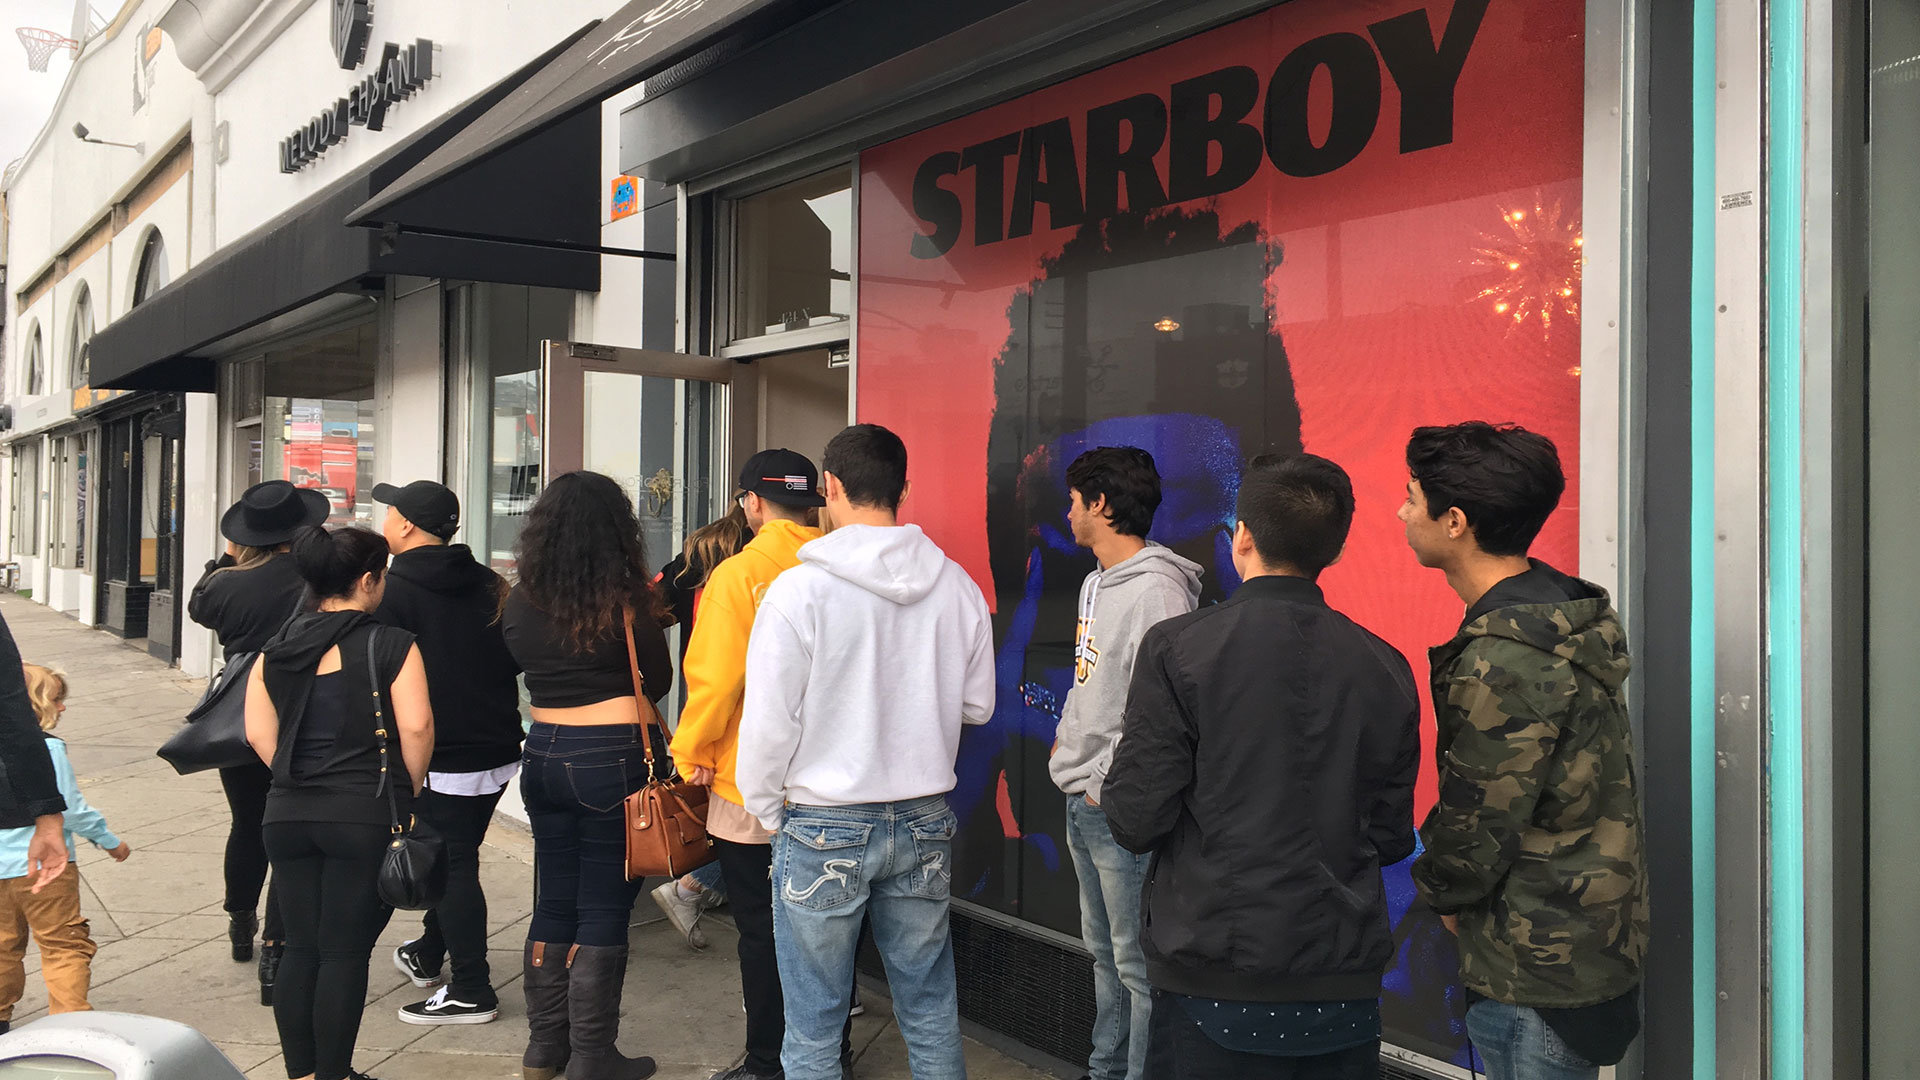 Pop Ups on Fairfax in Hollywood, CA